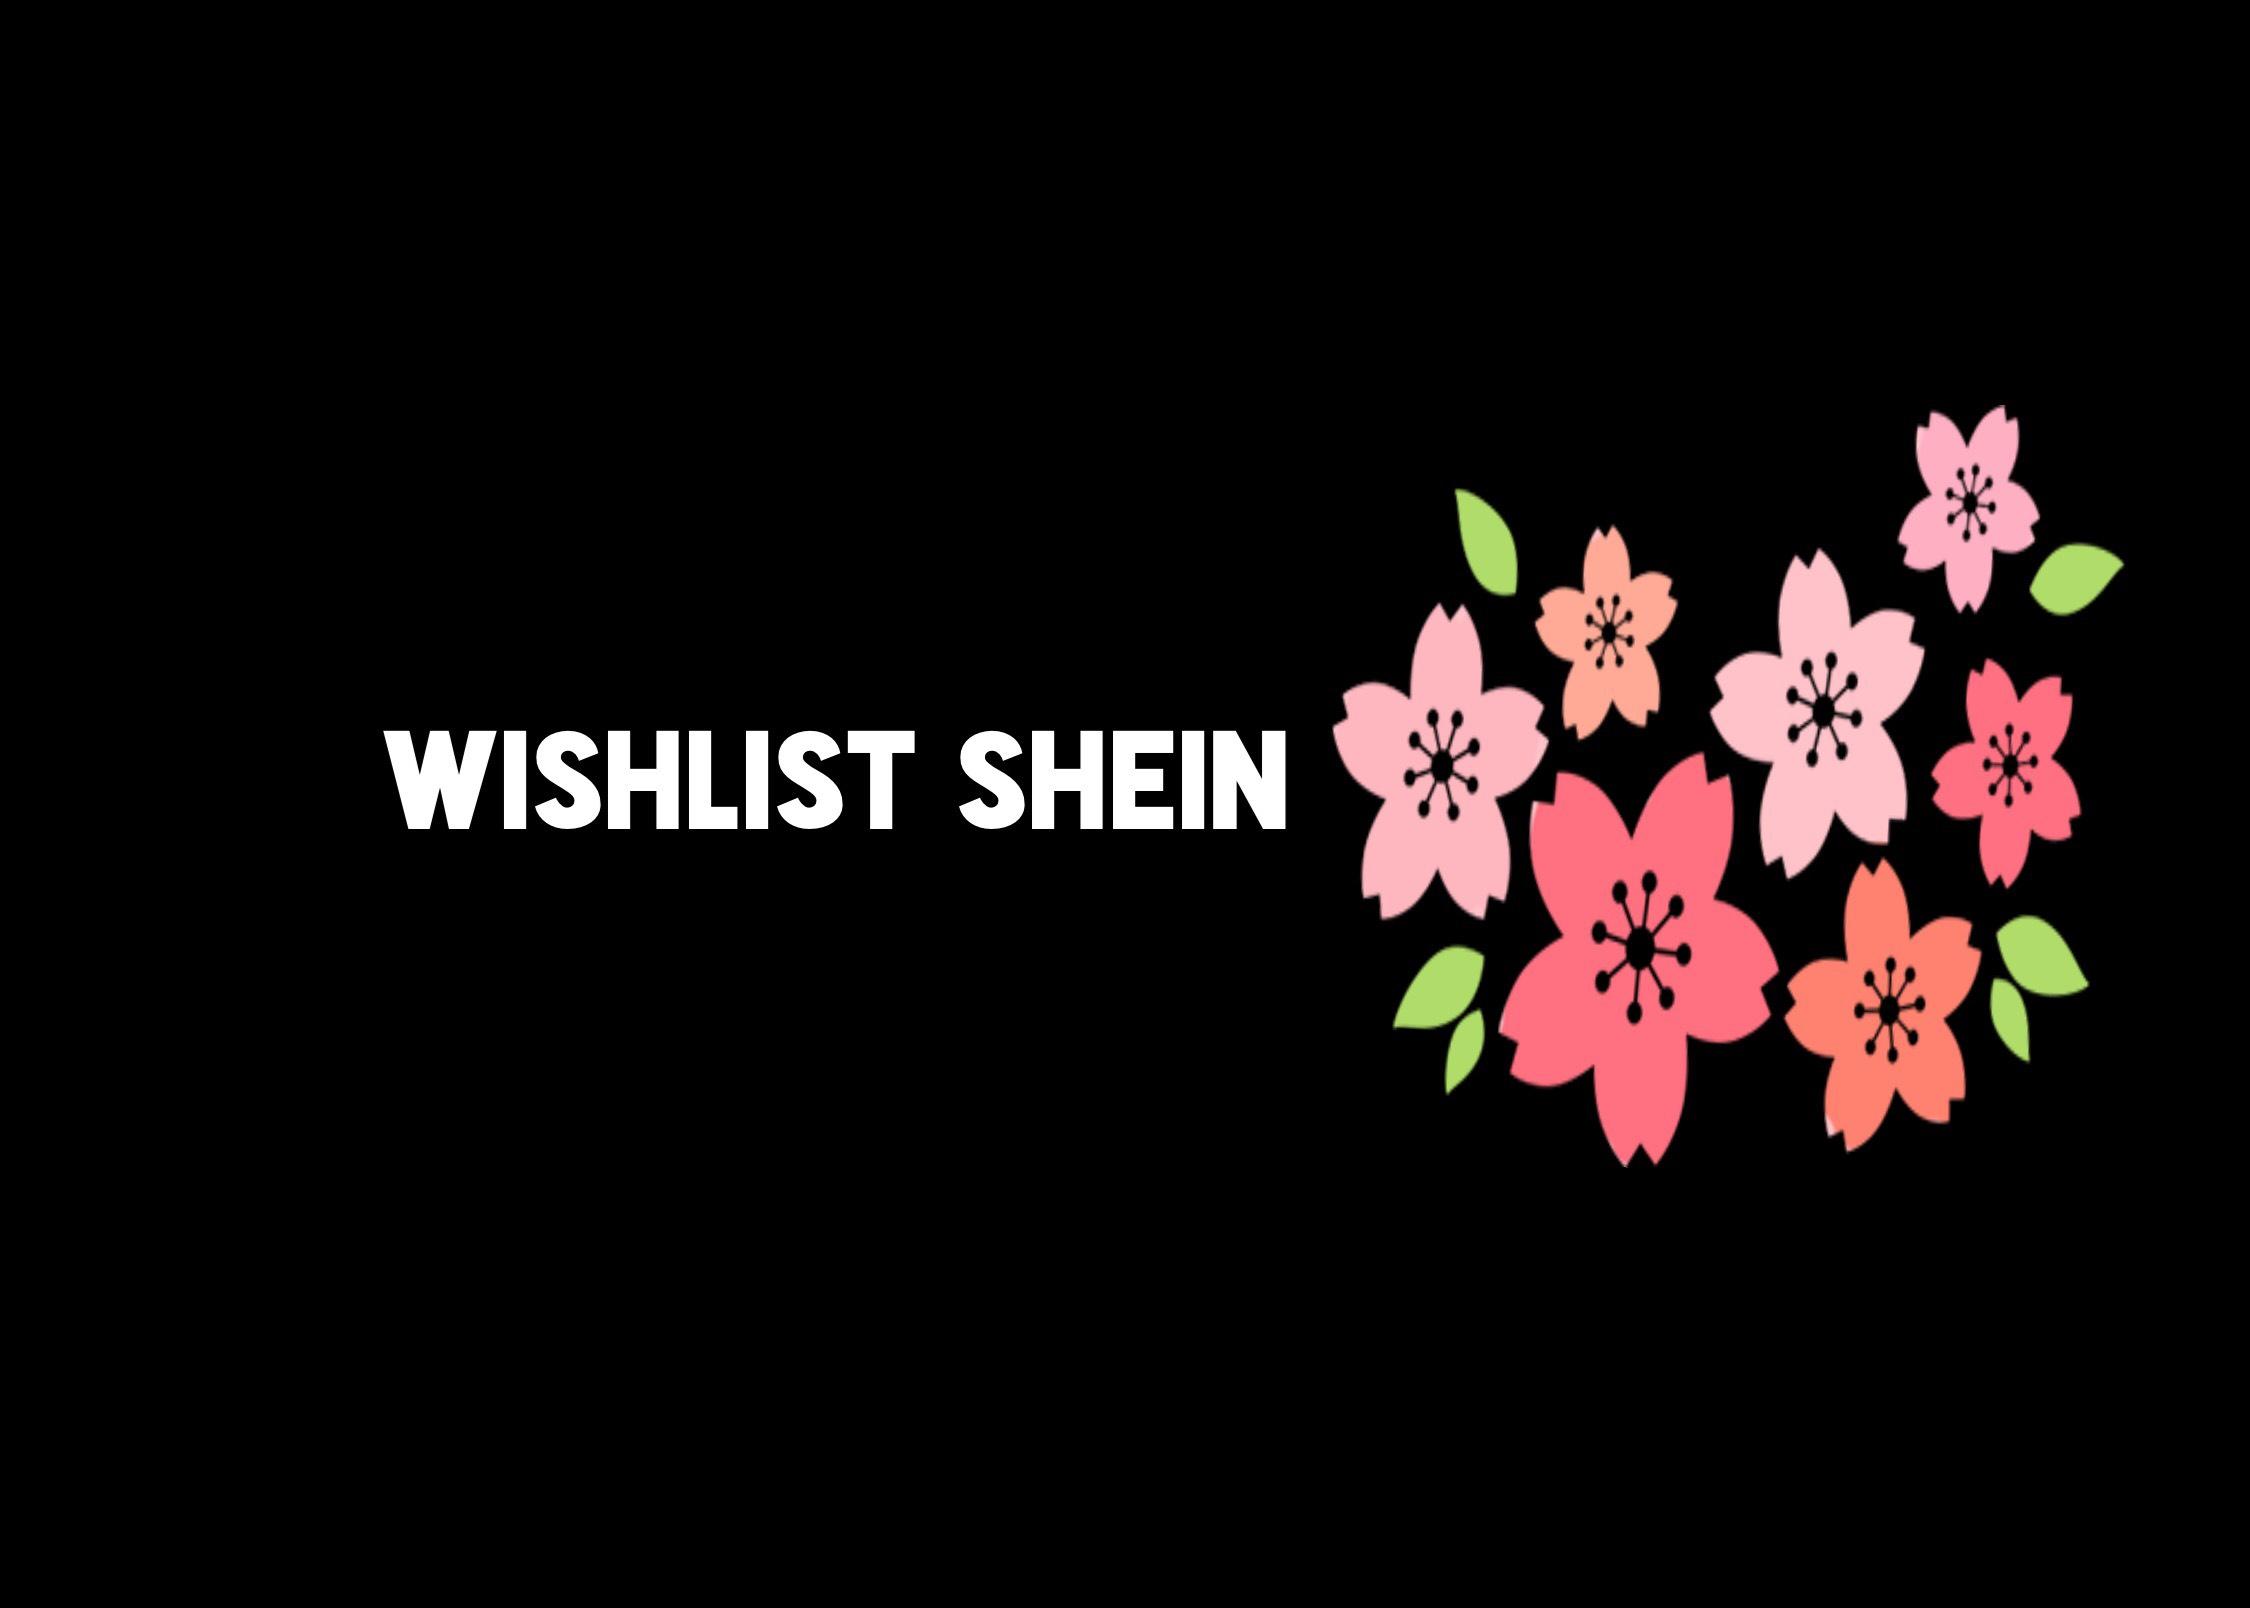 wishlist Shein